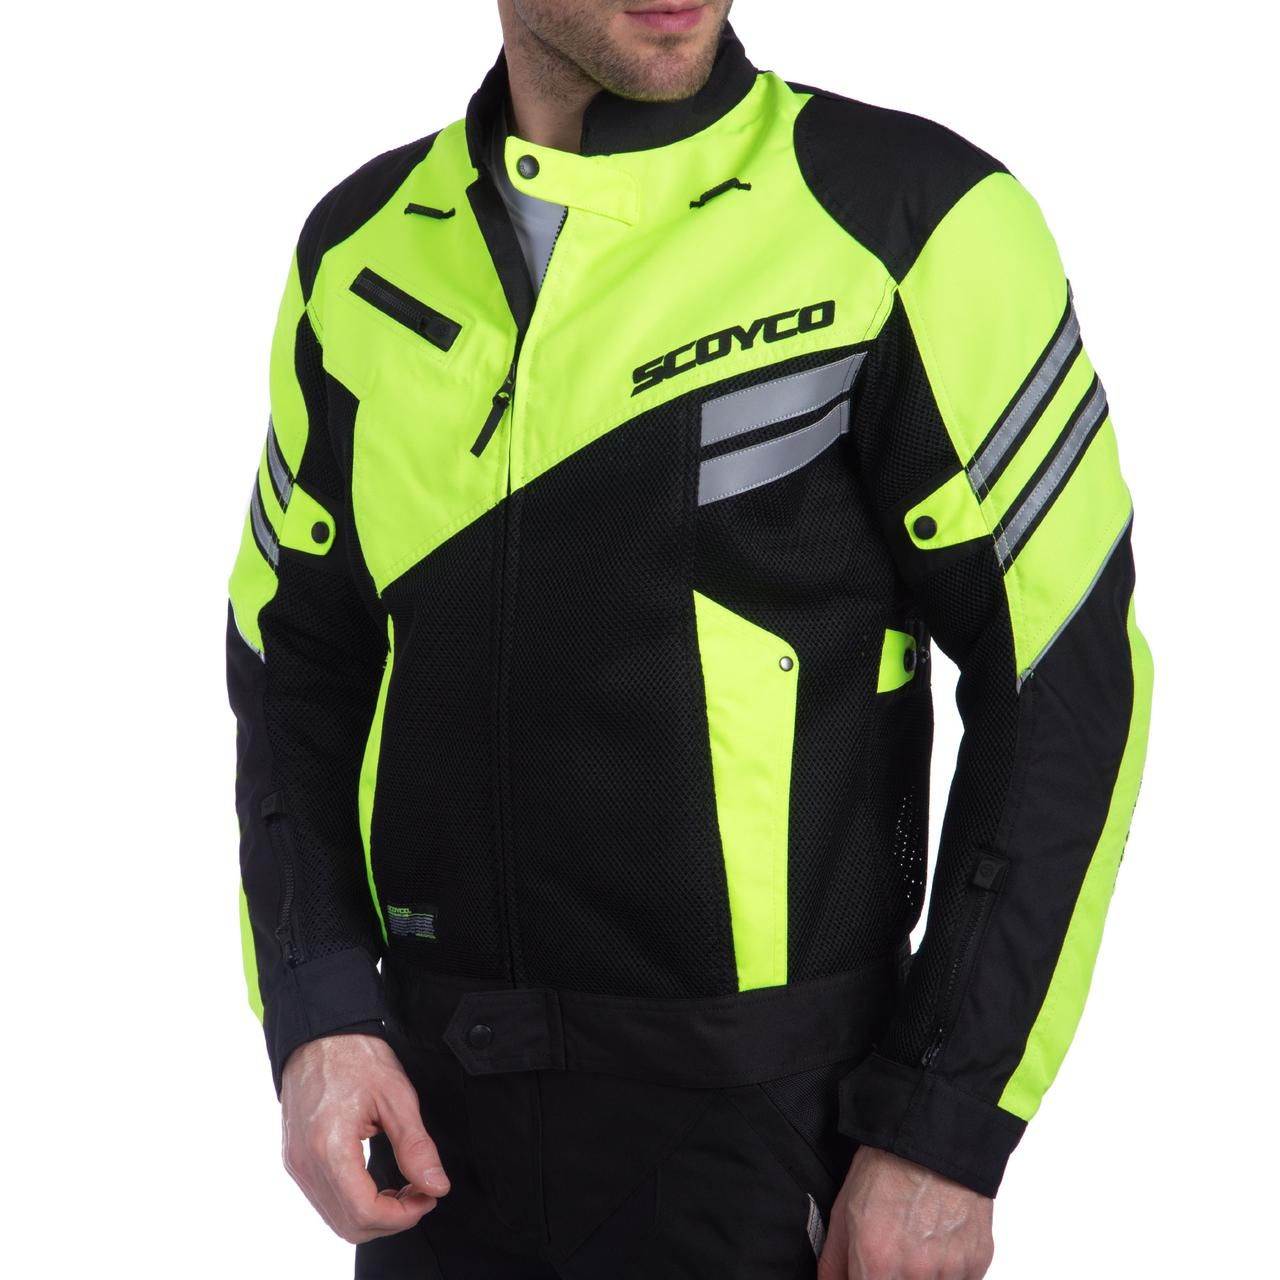 Мотокуртка Scoyco JK36 Green  Артмото - купить квадроцикл в украине и харькове, мотоцикл, снегоход, скутер, мопед, электромобиль